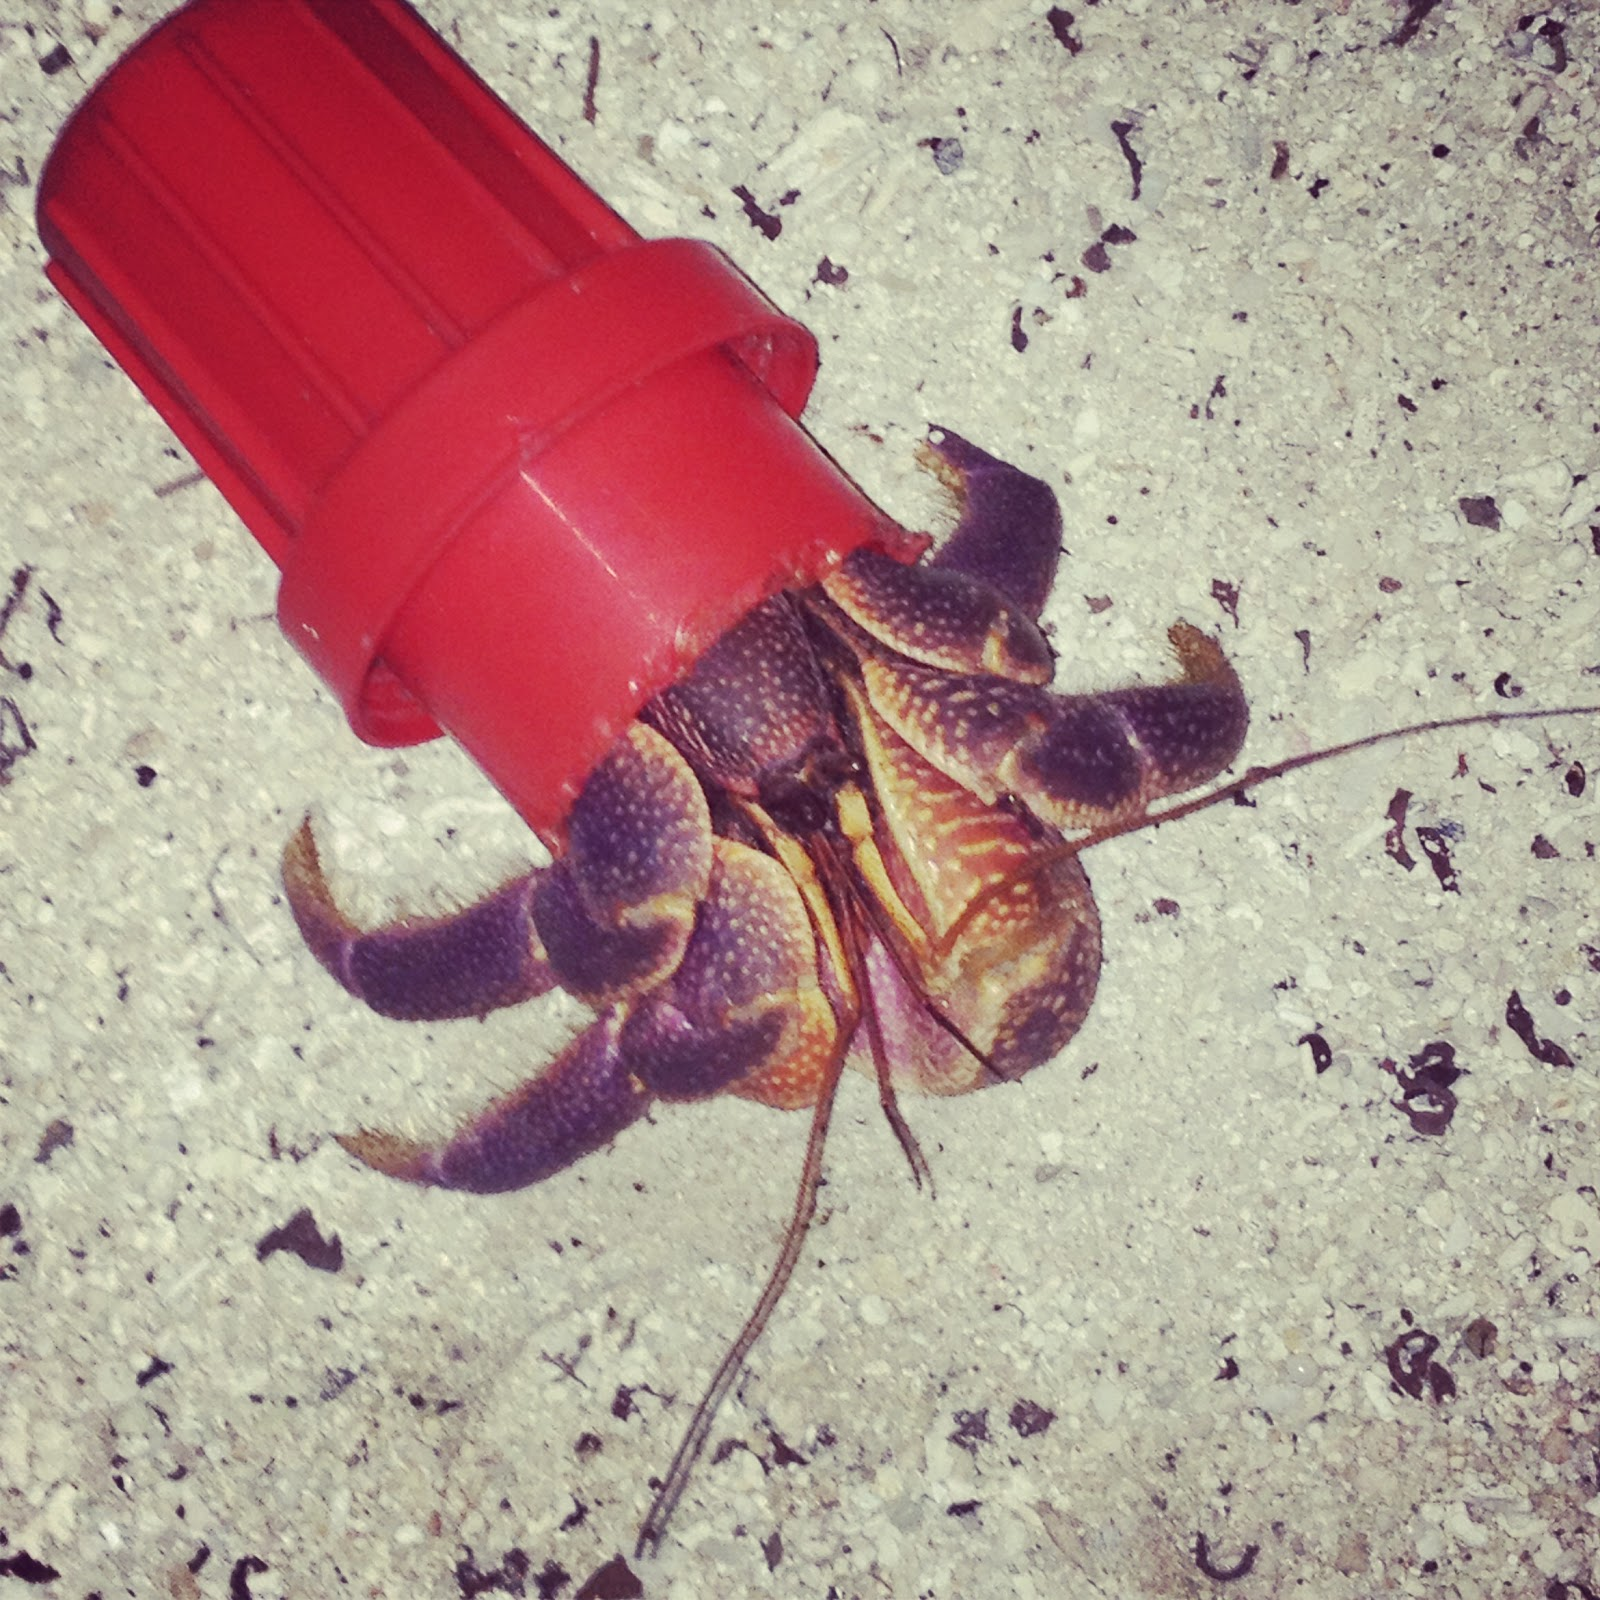 marine biology blog a hermit crab makes a plastic home we dive